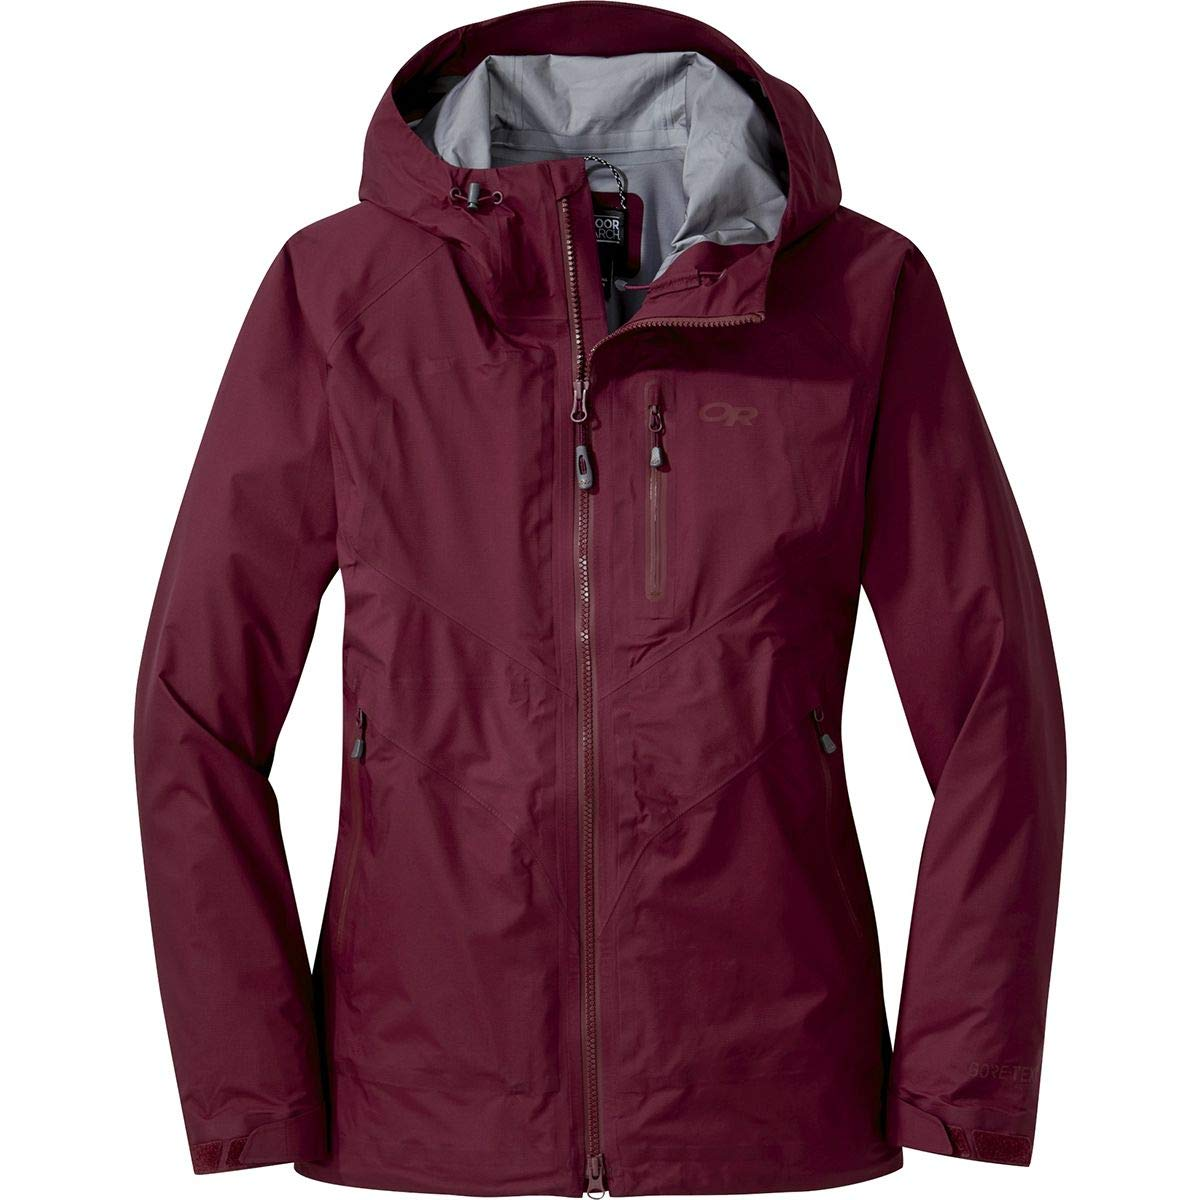 Garnet Outdoor Research Women's Optimizer Jacket